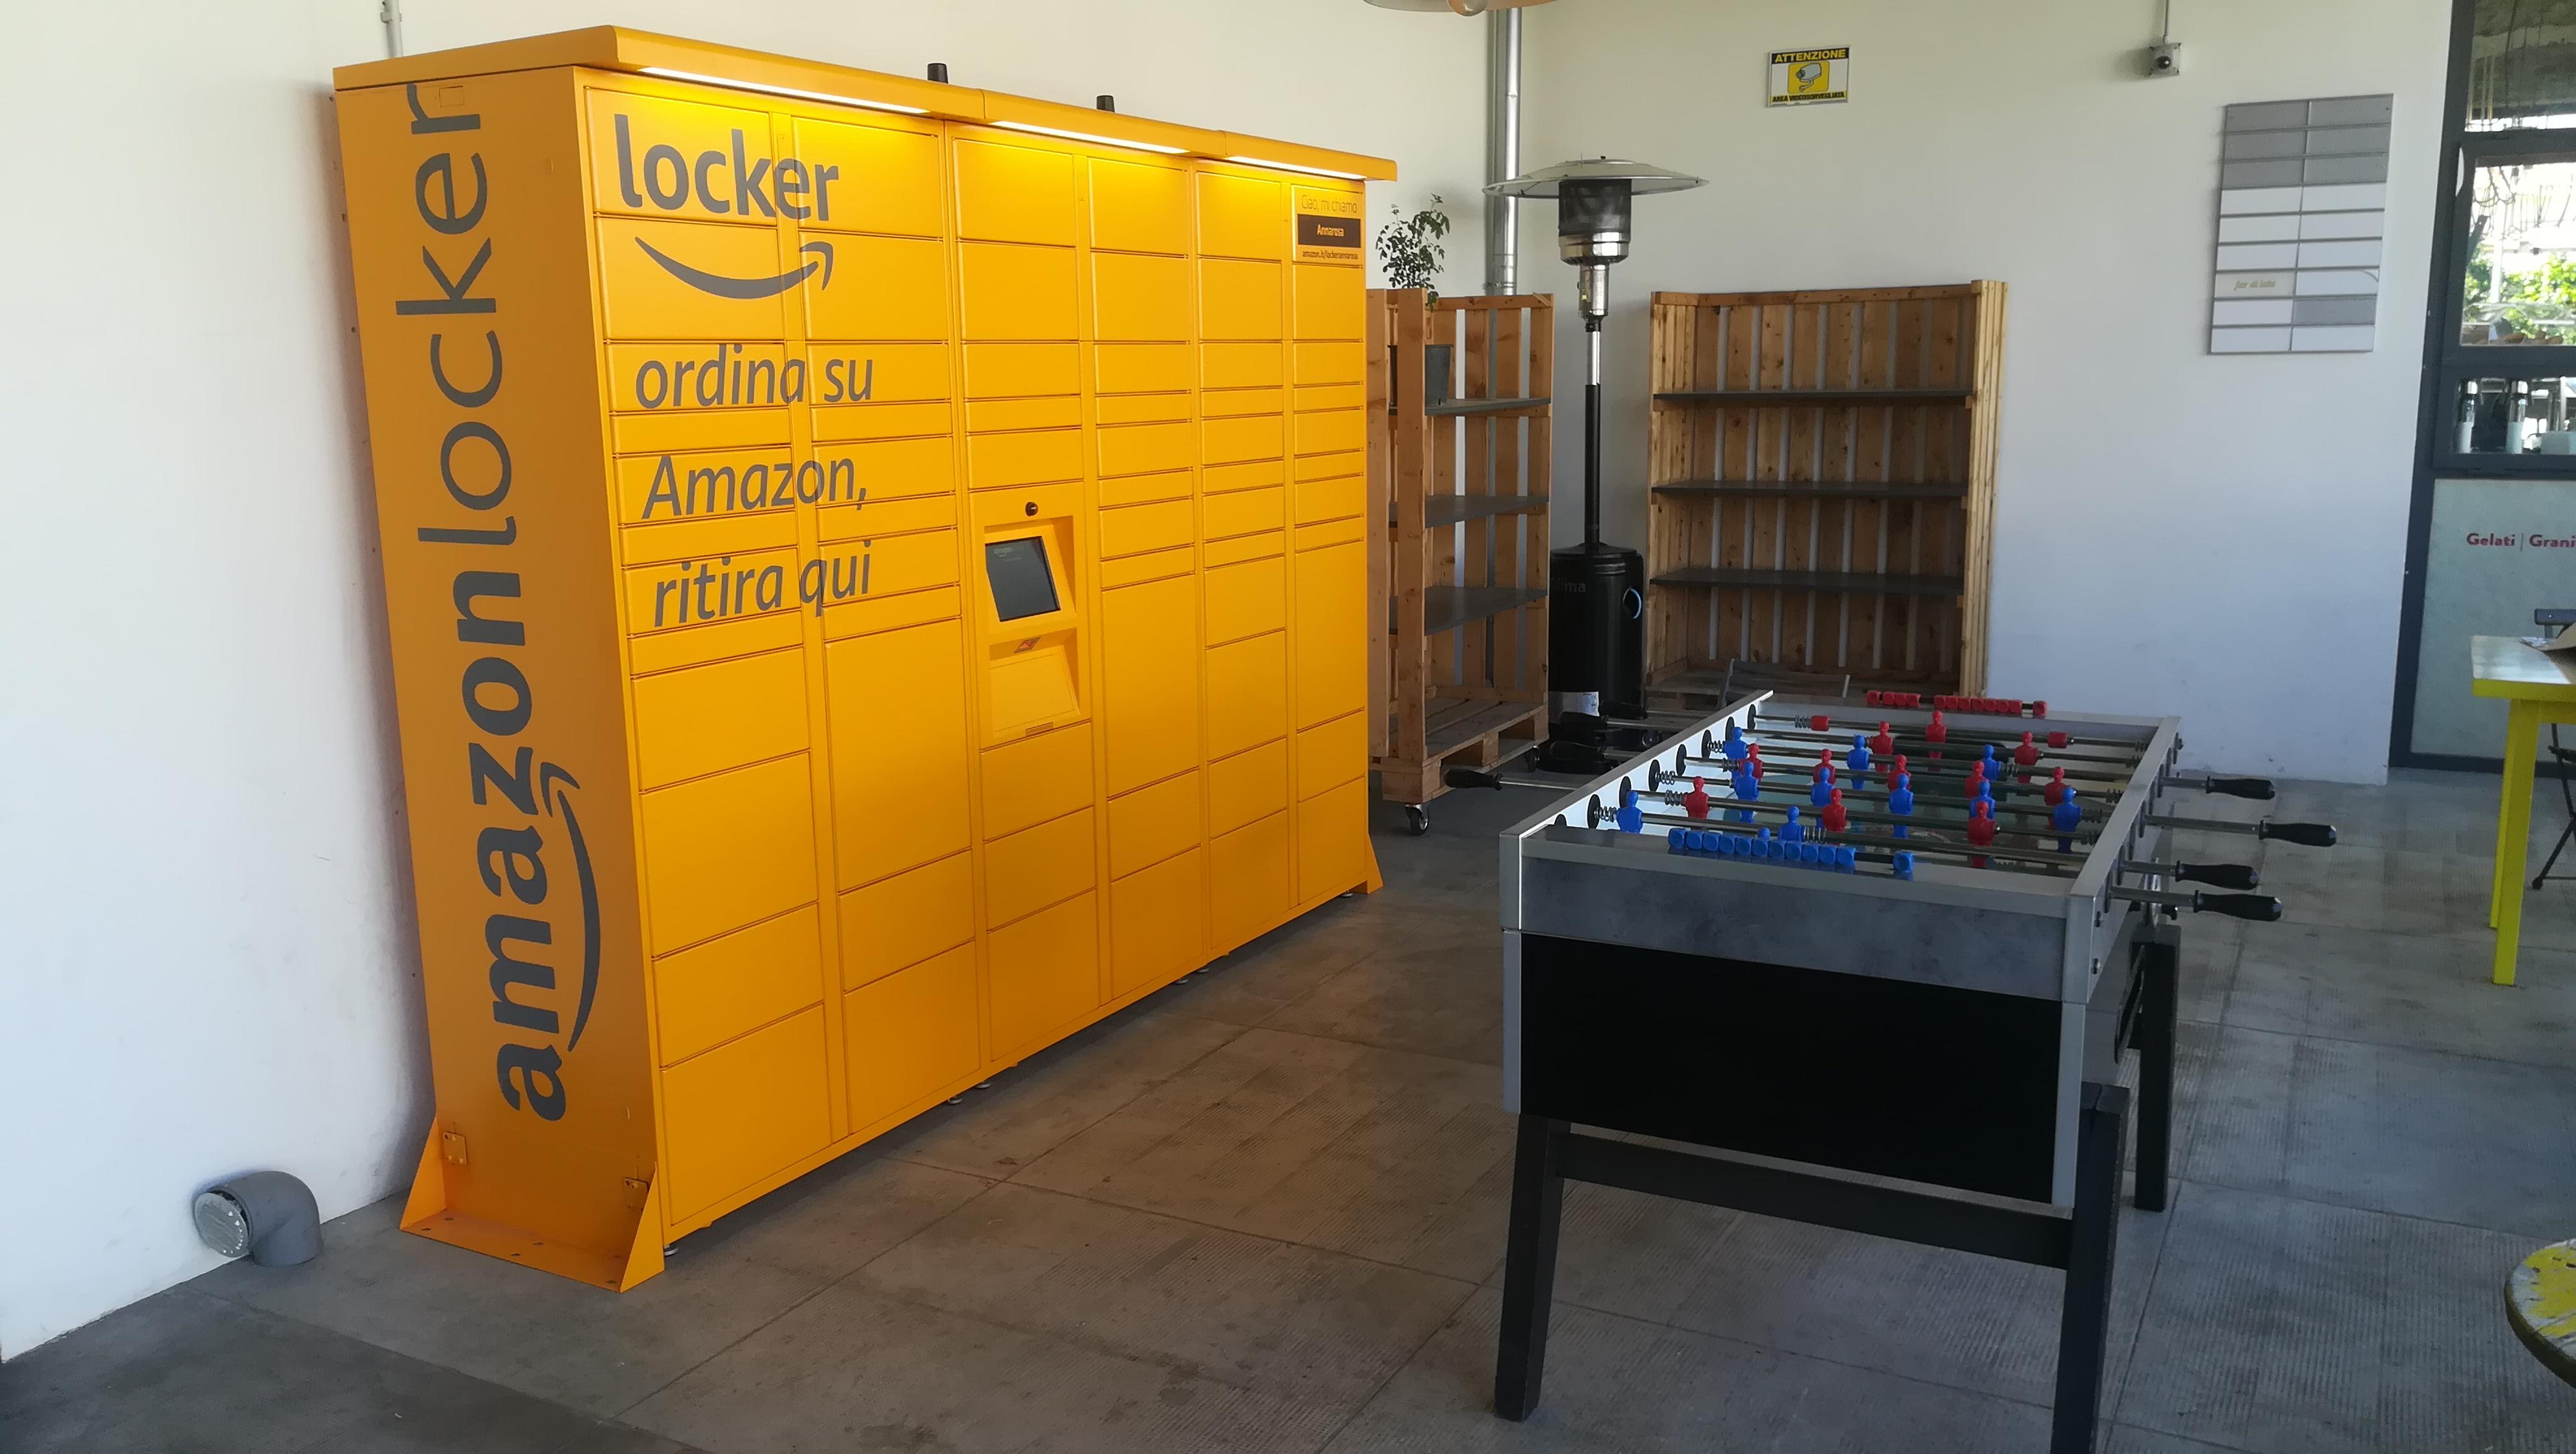 amazon locker SanLorenzo Mercato